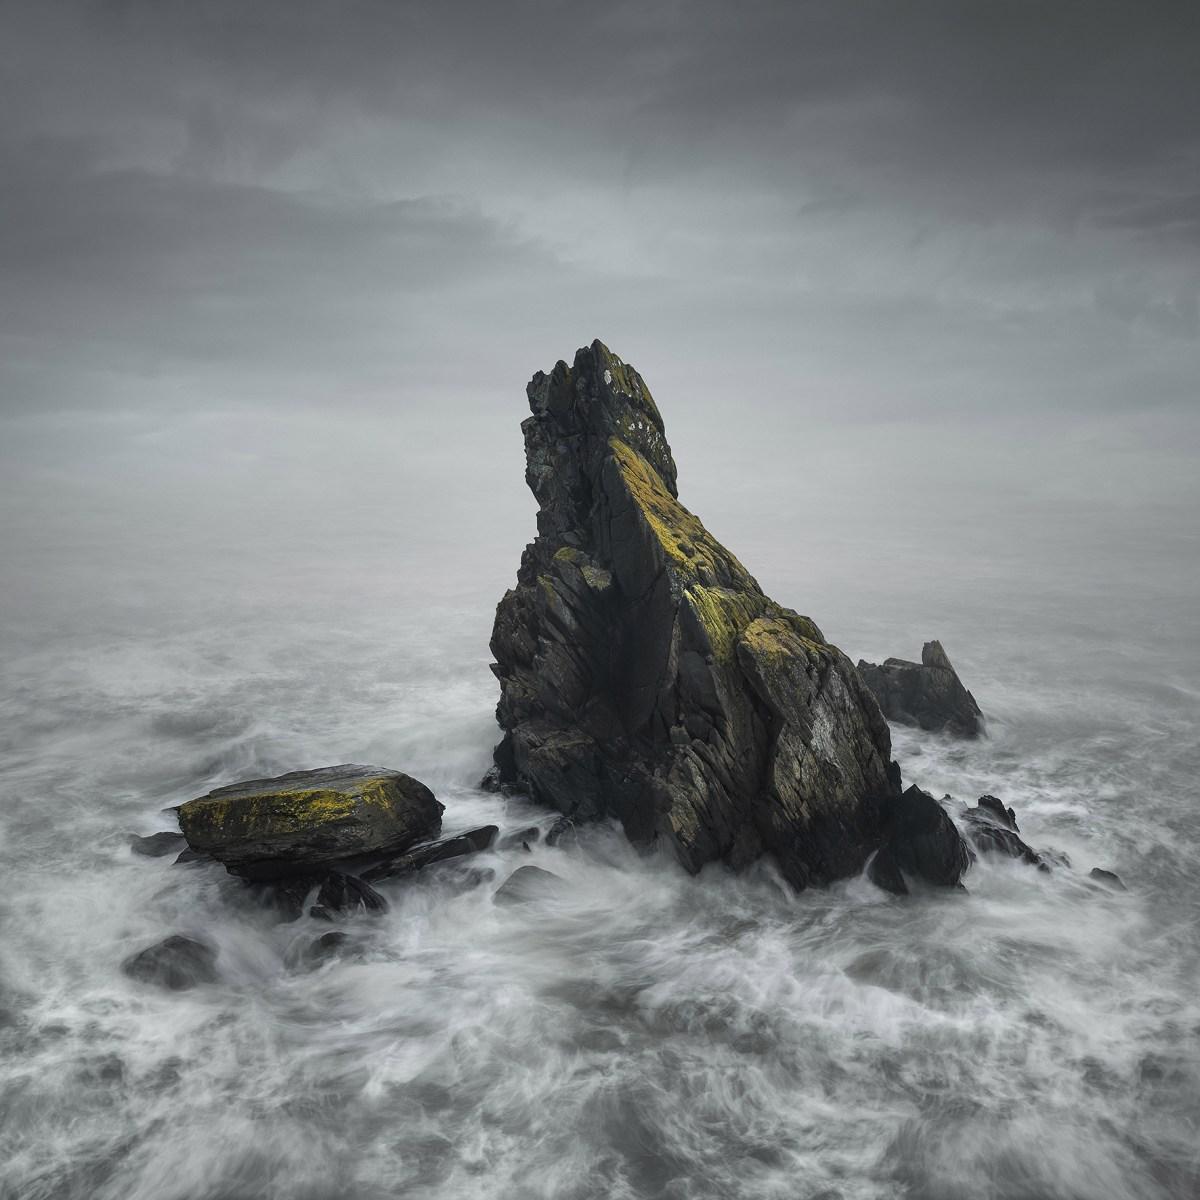 photography-neil-burnell-05